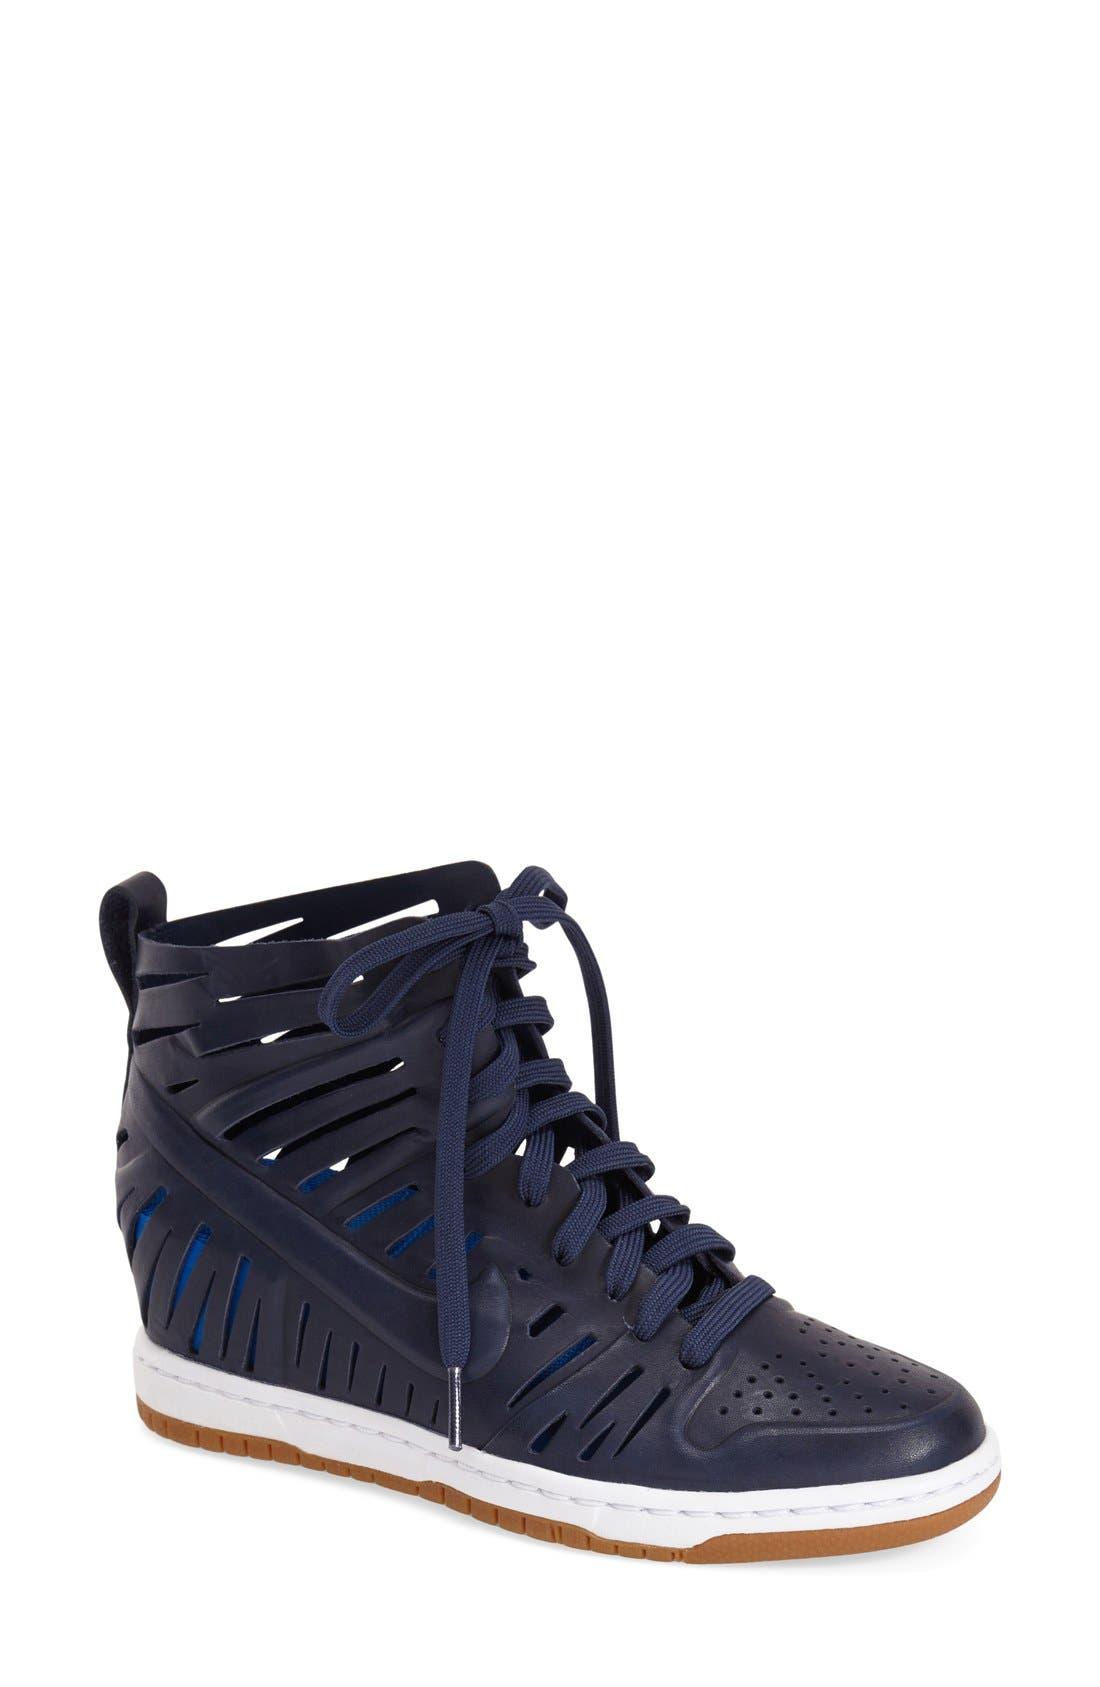 huge discount ca390 03871 ... purchase main image nike dunk sky hi joli hidden wedge sneaker women  a5660 01404